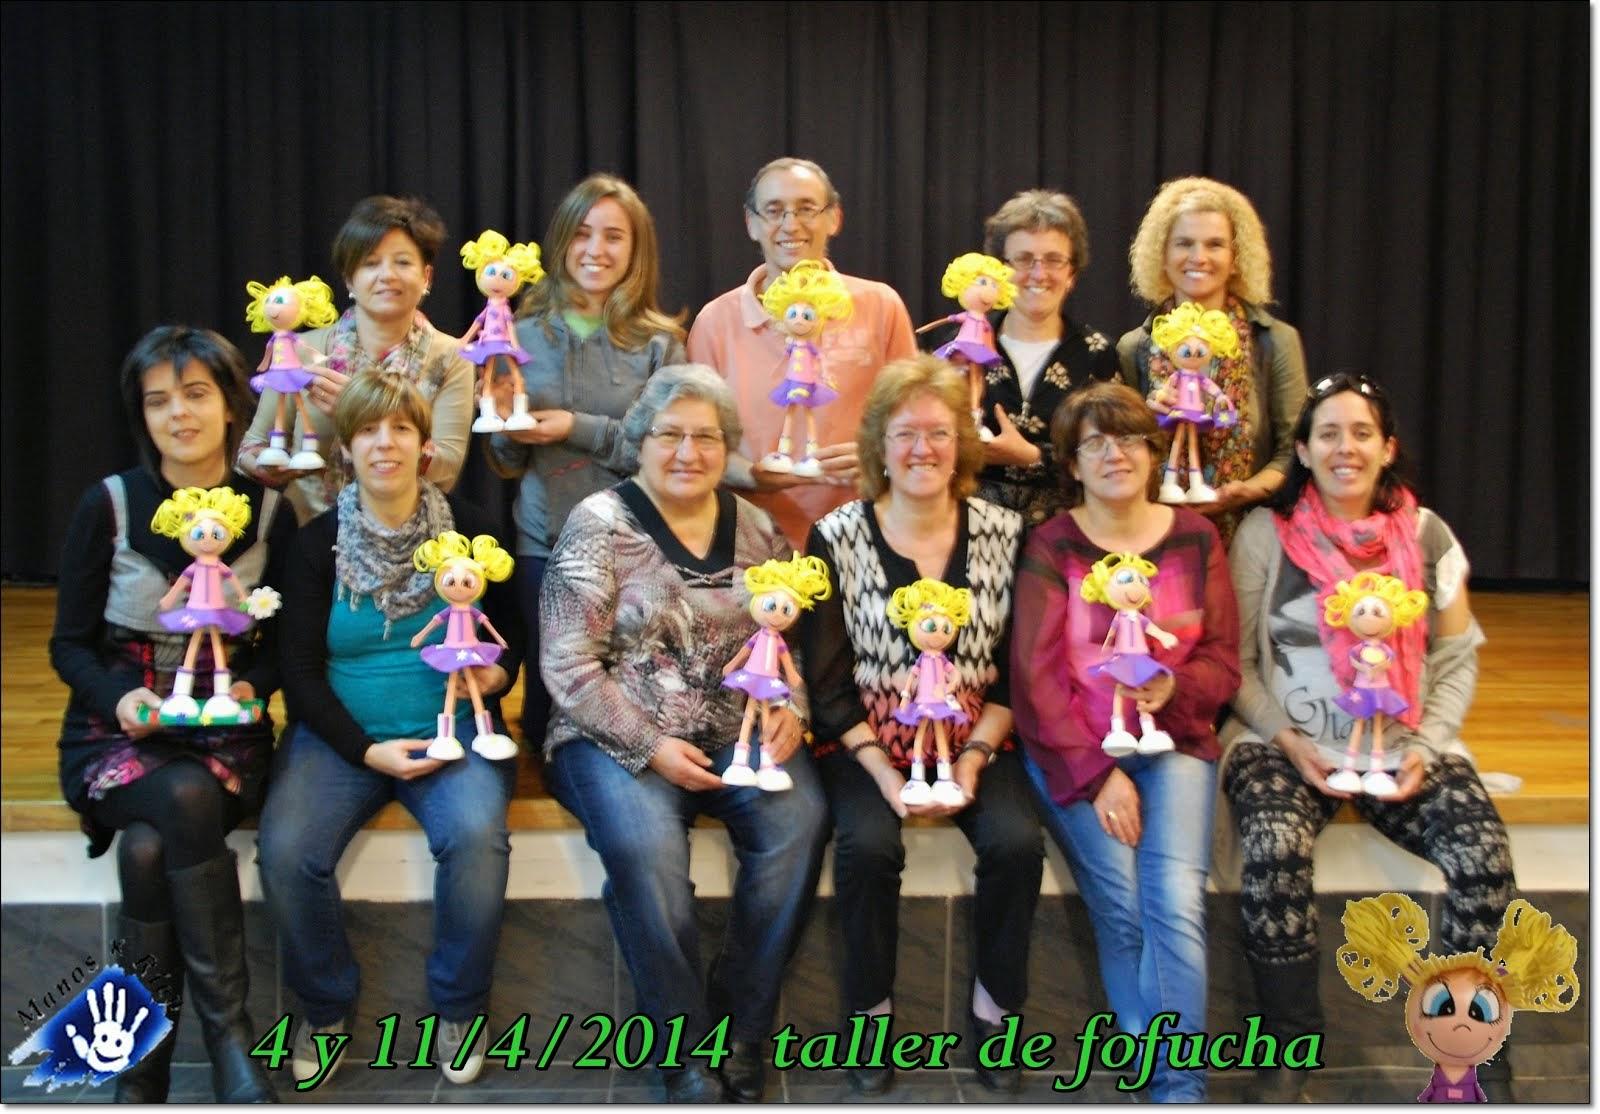 taller de fofucha 2014